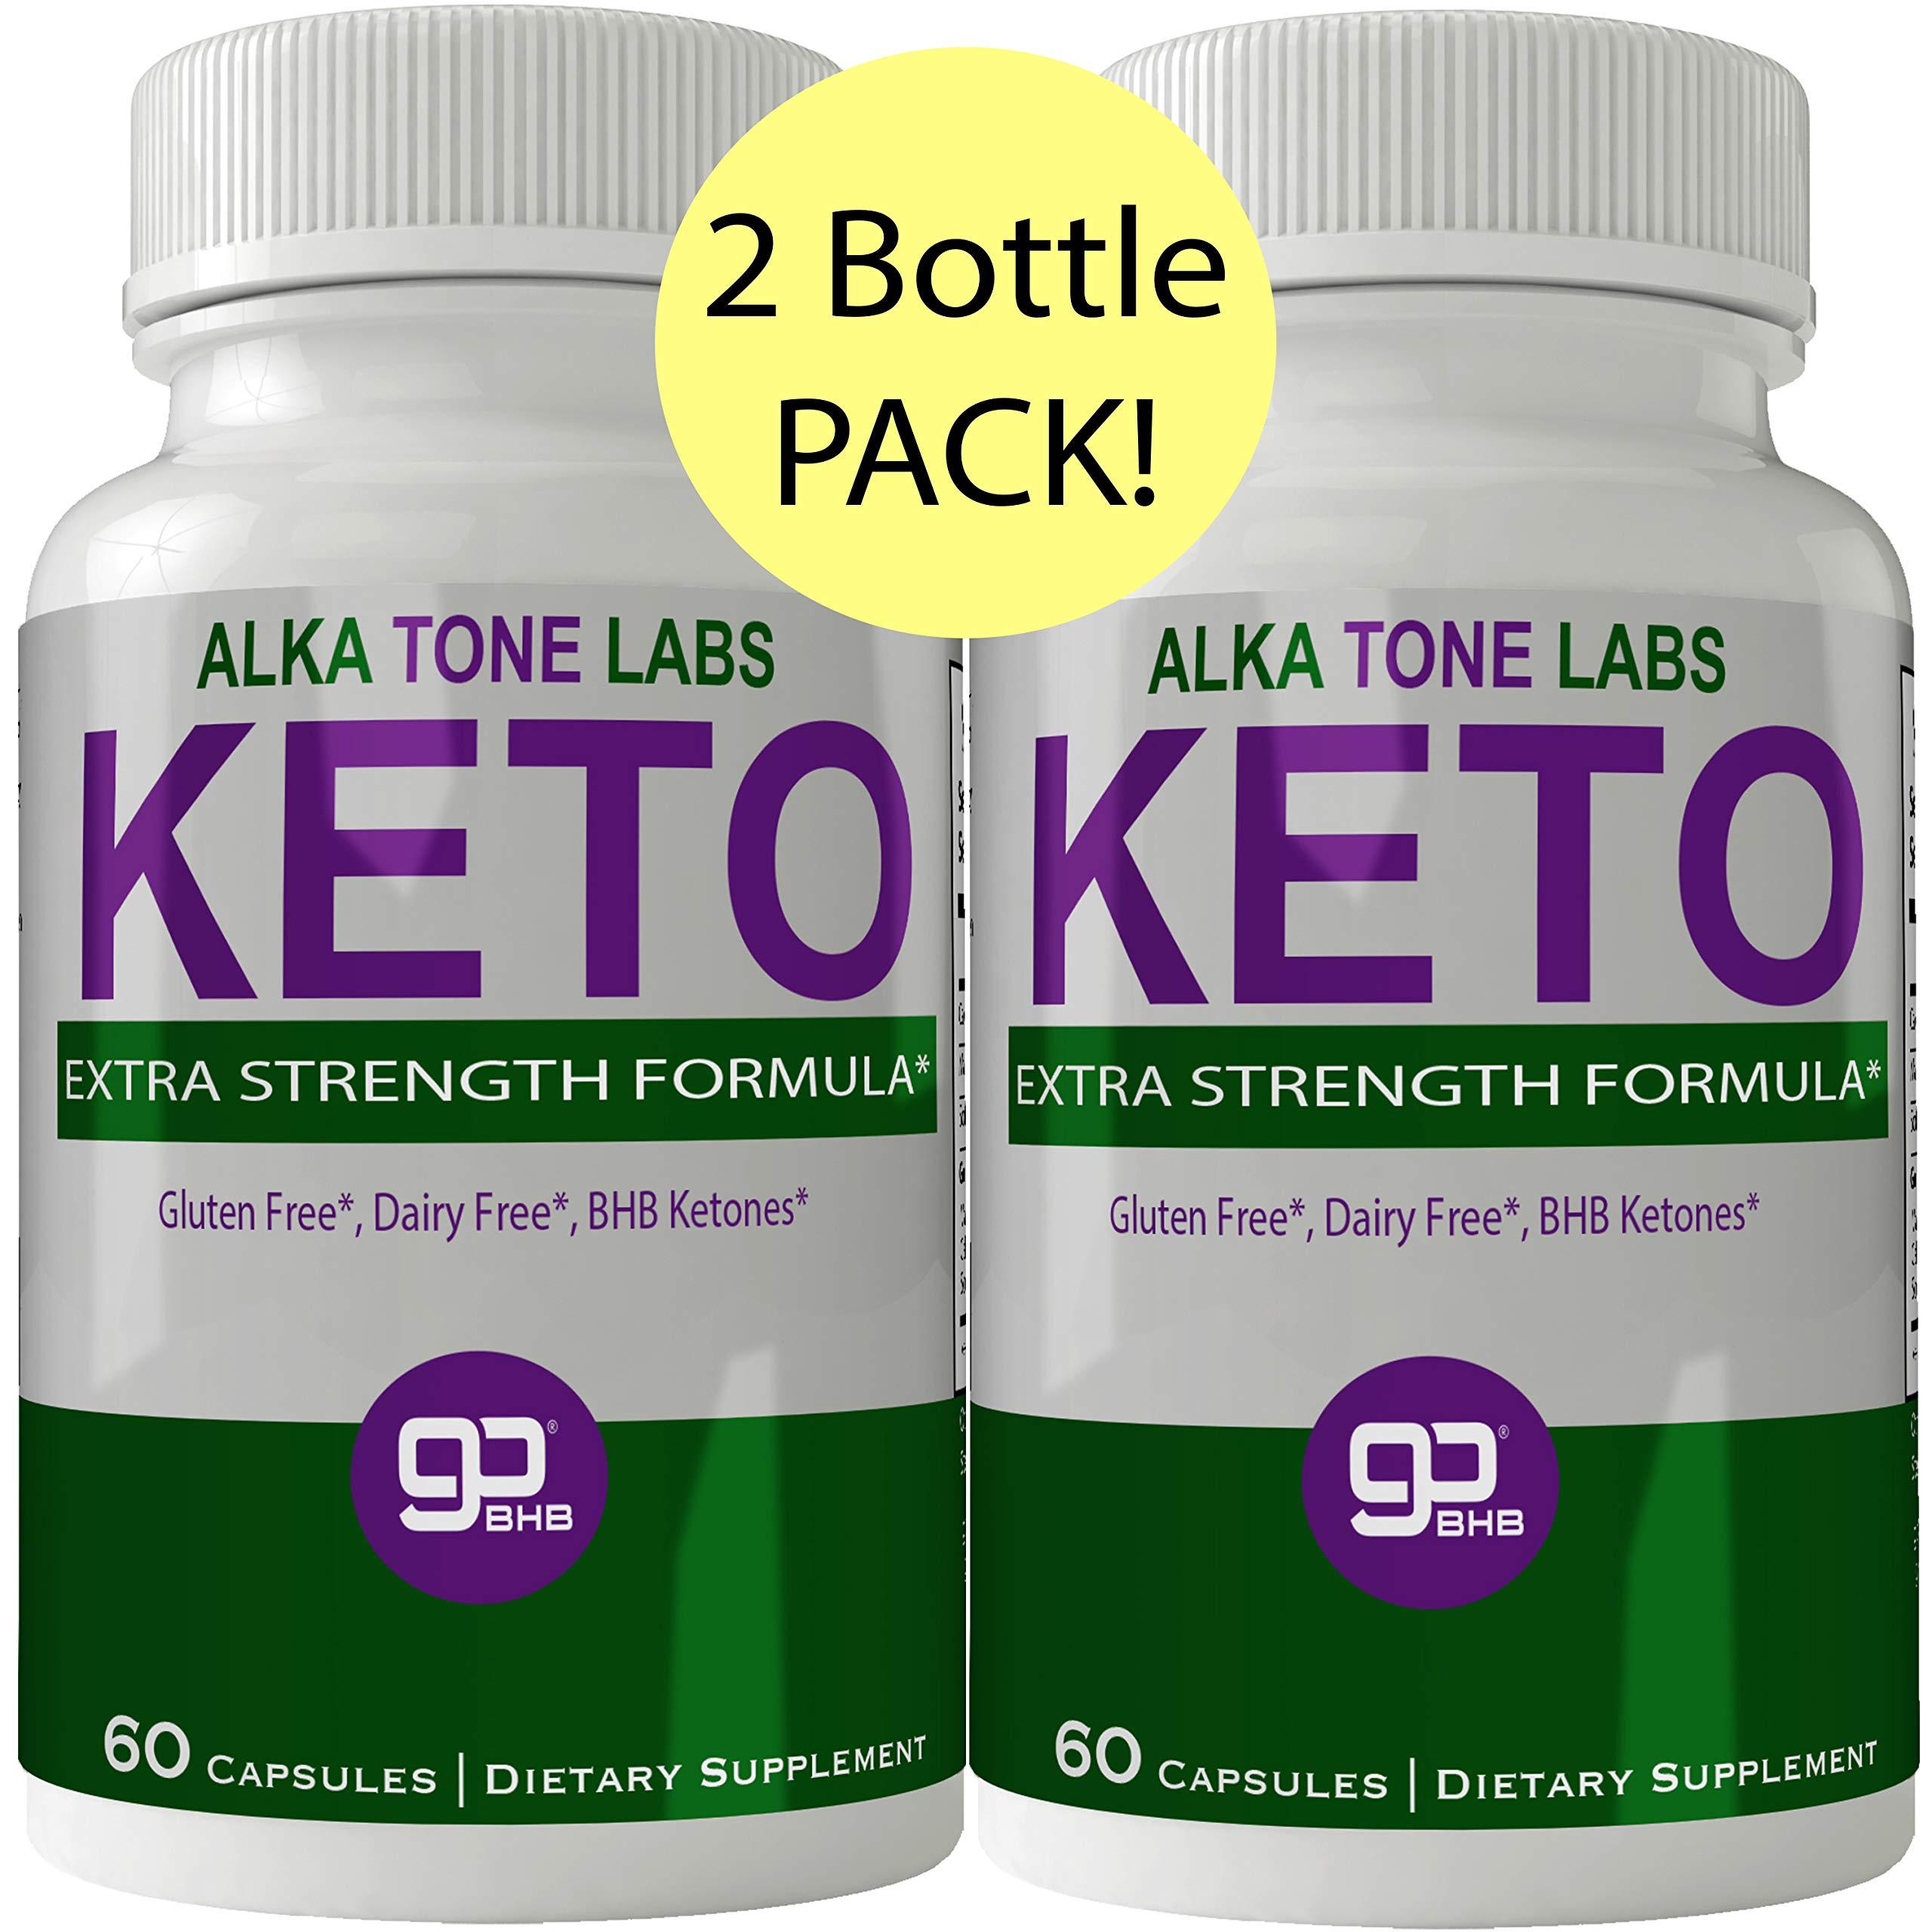 Alkatone Labs Keto BHB Weight Loss Pills 2 Bottle Pack, Advanced Natural Ketogenic Burn Fat Supplement, 800 mg Formula with New True Slim GO BHB Salts Formula, Advanced Appetite Suppressant Capsules by nutra4health LLC